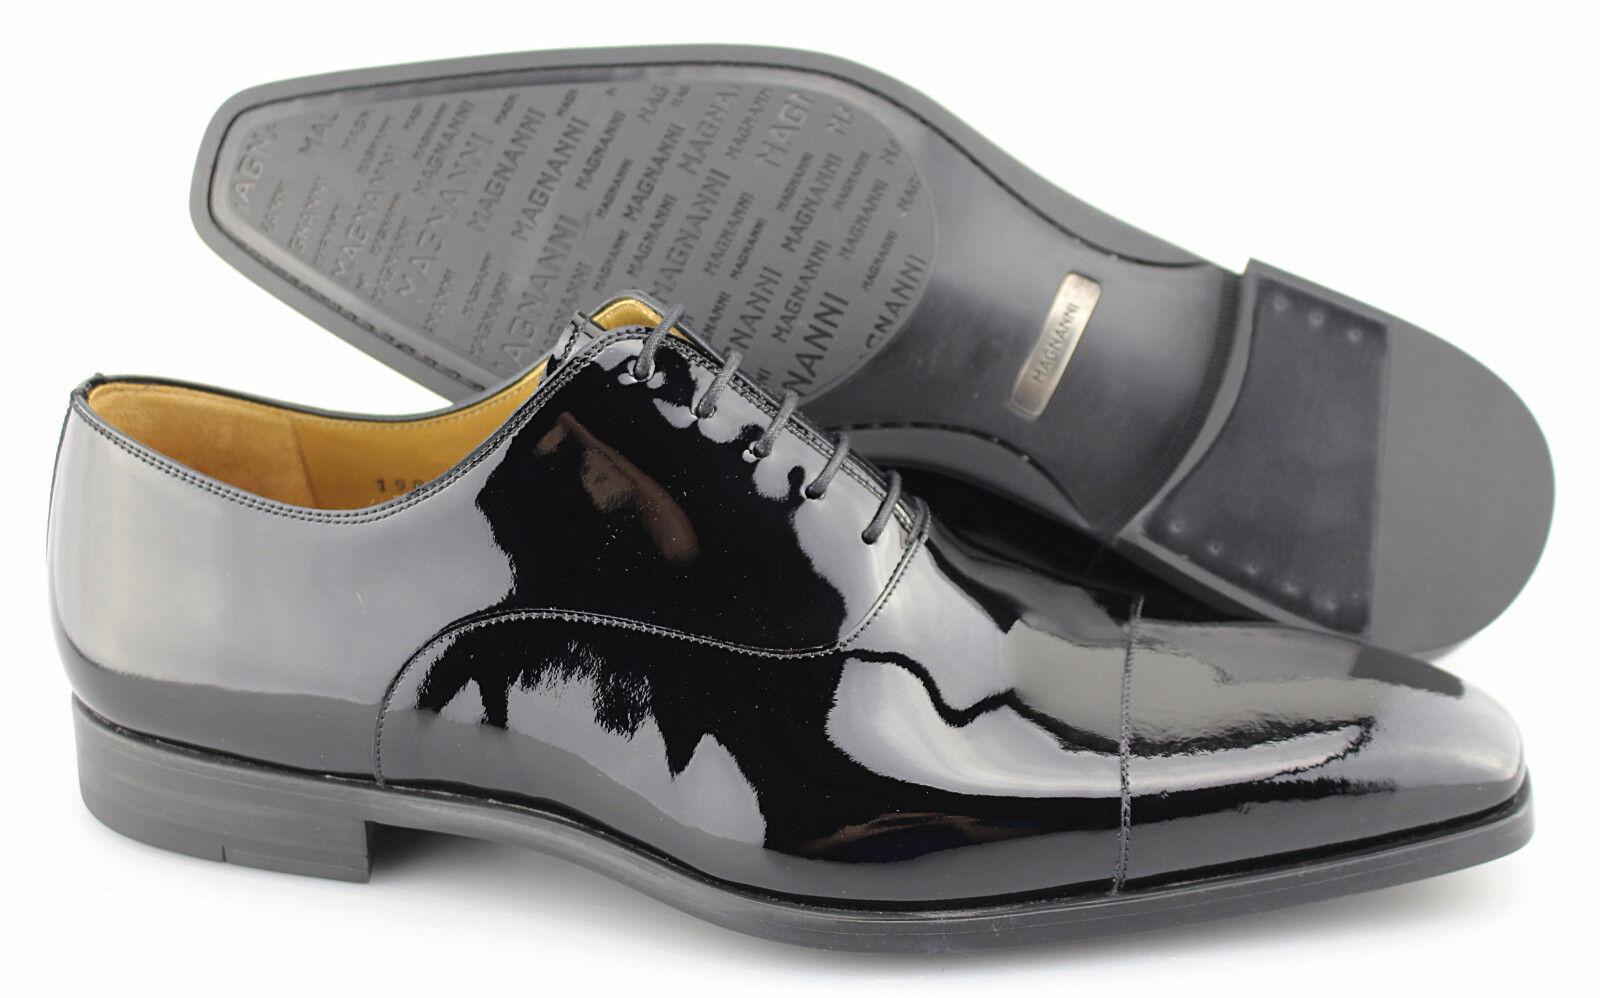 Manglanni  Clint  negro zapatos de cuero de Oxford talla  US 11.5-d